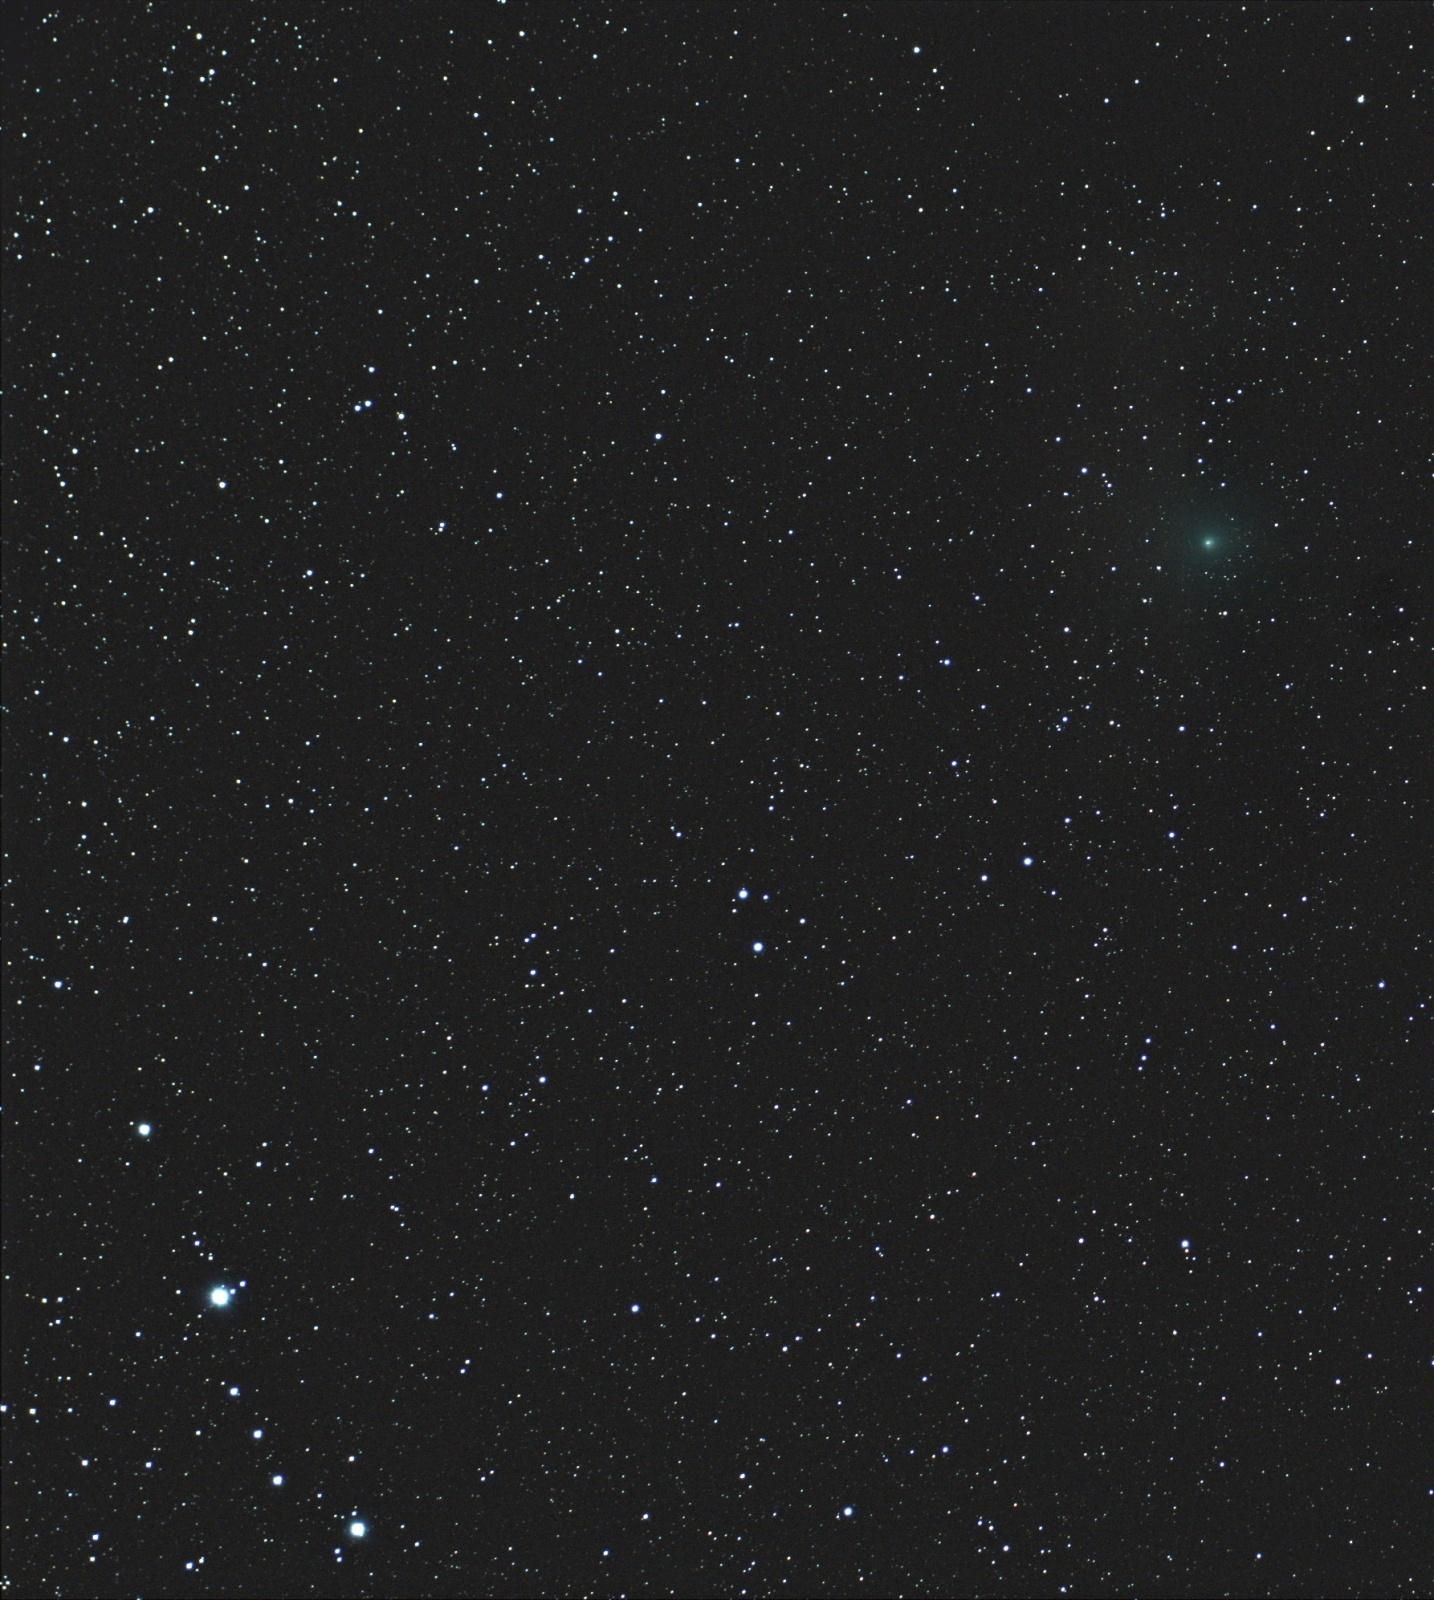 C_2020_M3_Atlas_Collinder_69_30x30s_1.jpg